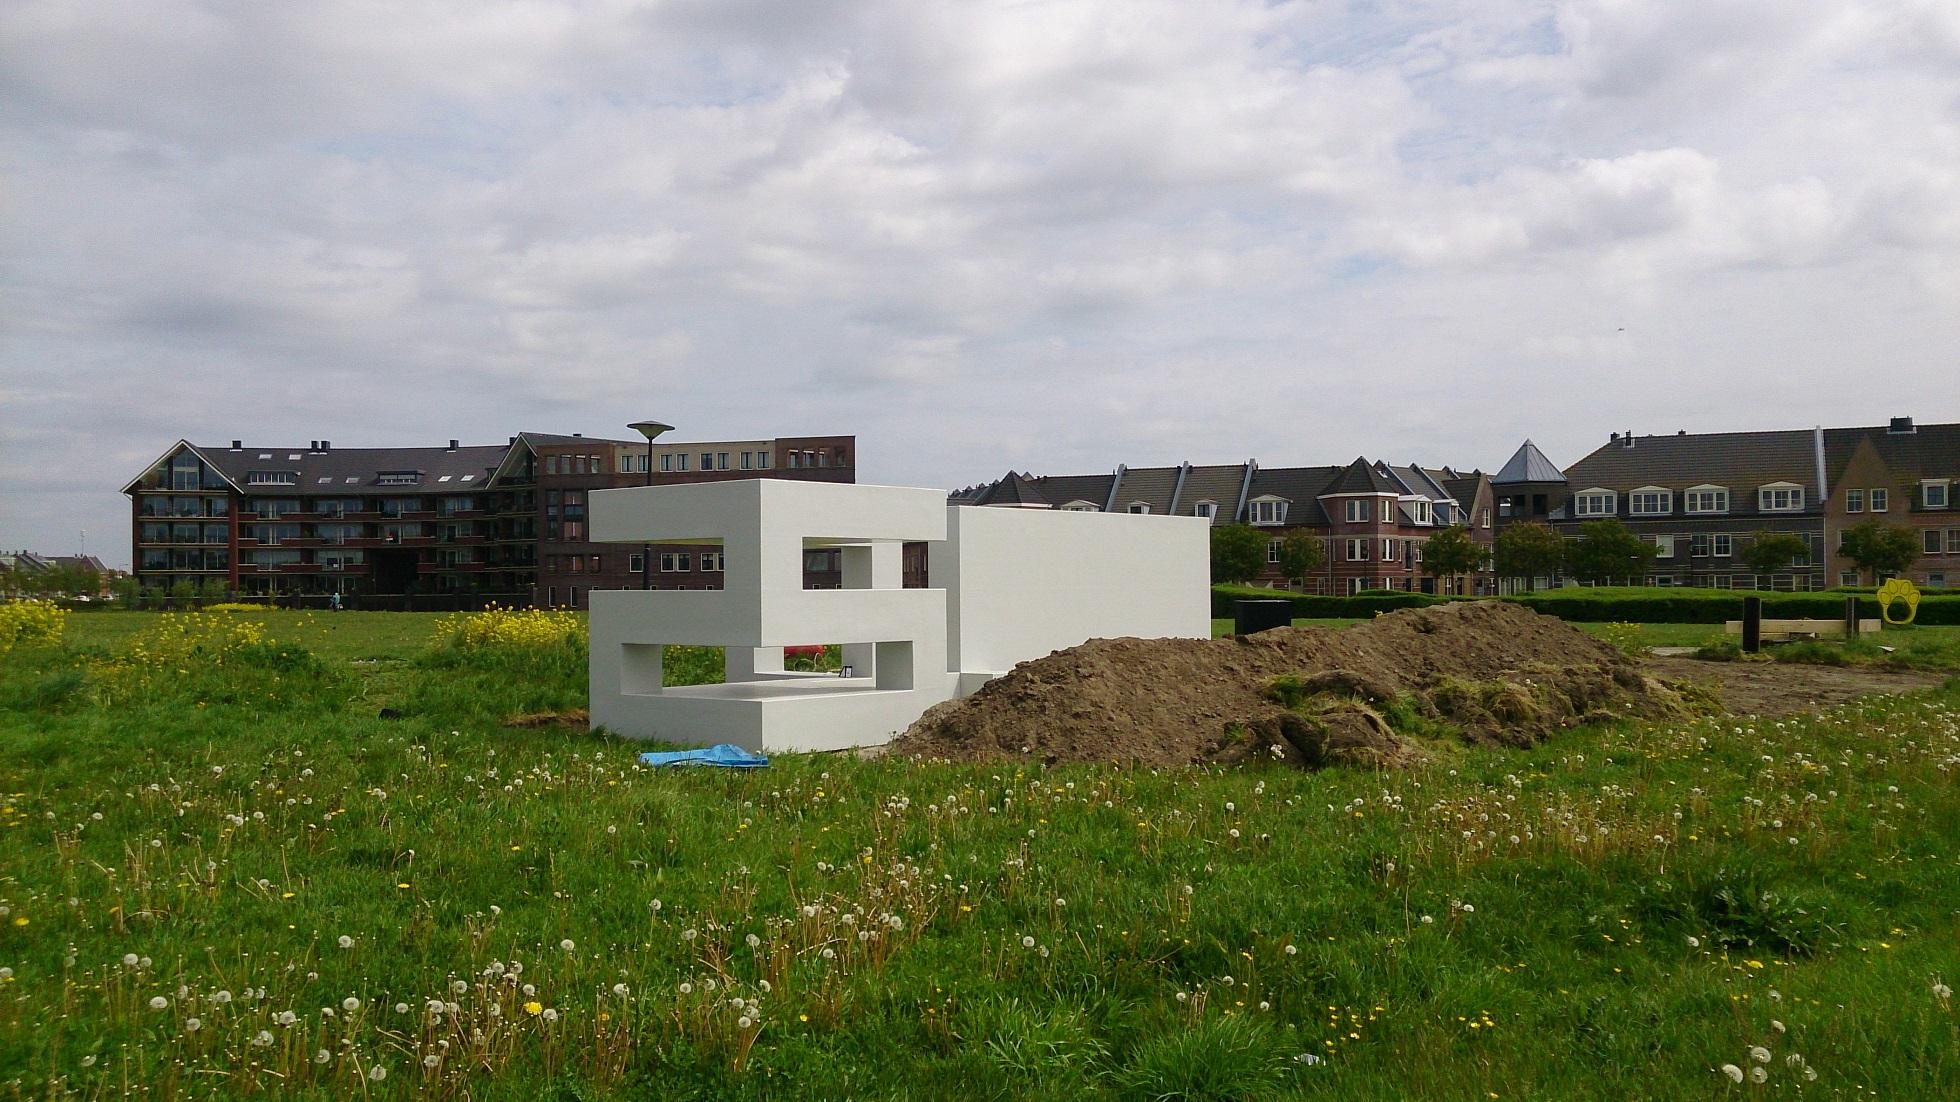 JOP Heemskerk Hupkens Maurer kunstwerk kunstobject